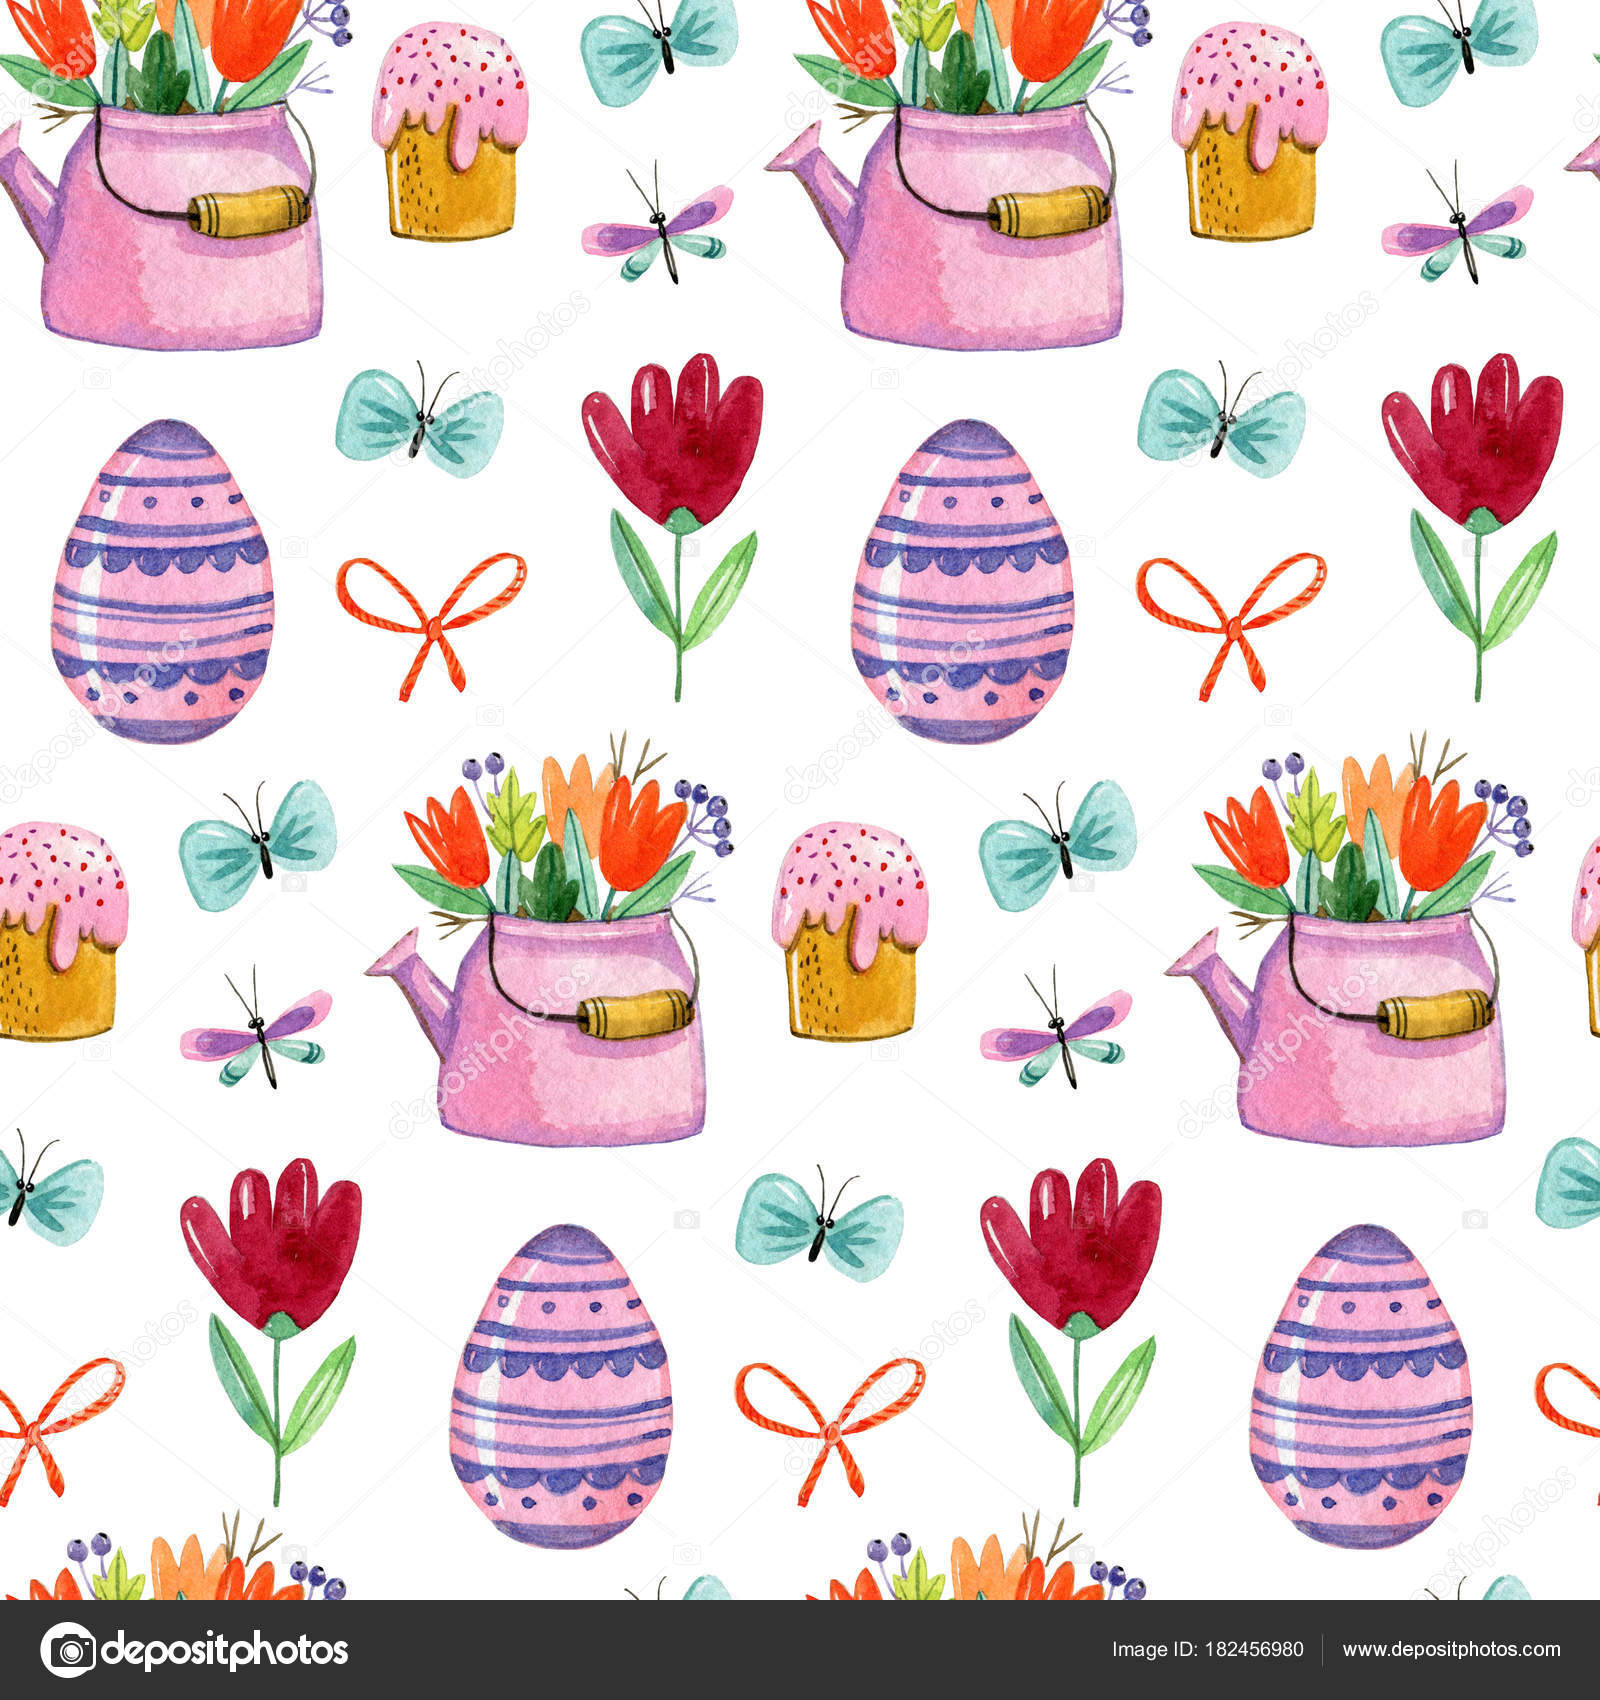 Mano Acuarela Dibujo Patrón Con Muffins Pascua Teteras Con Arcos ...